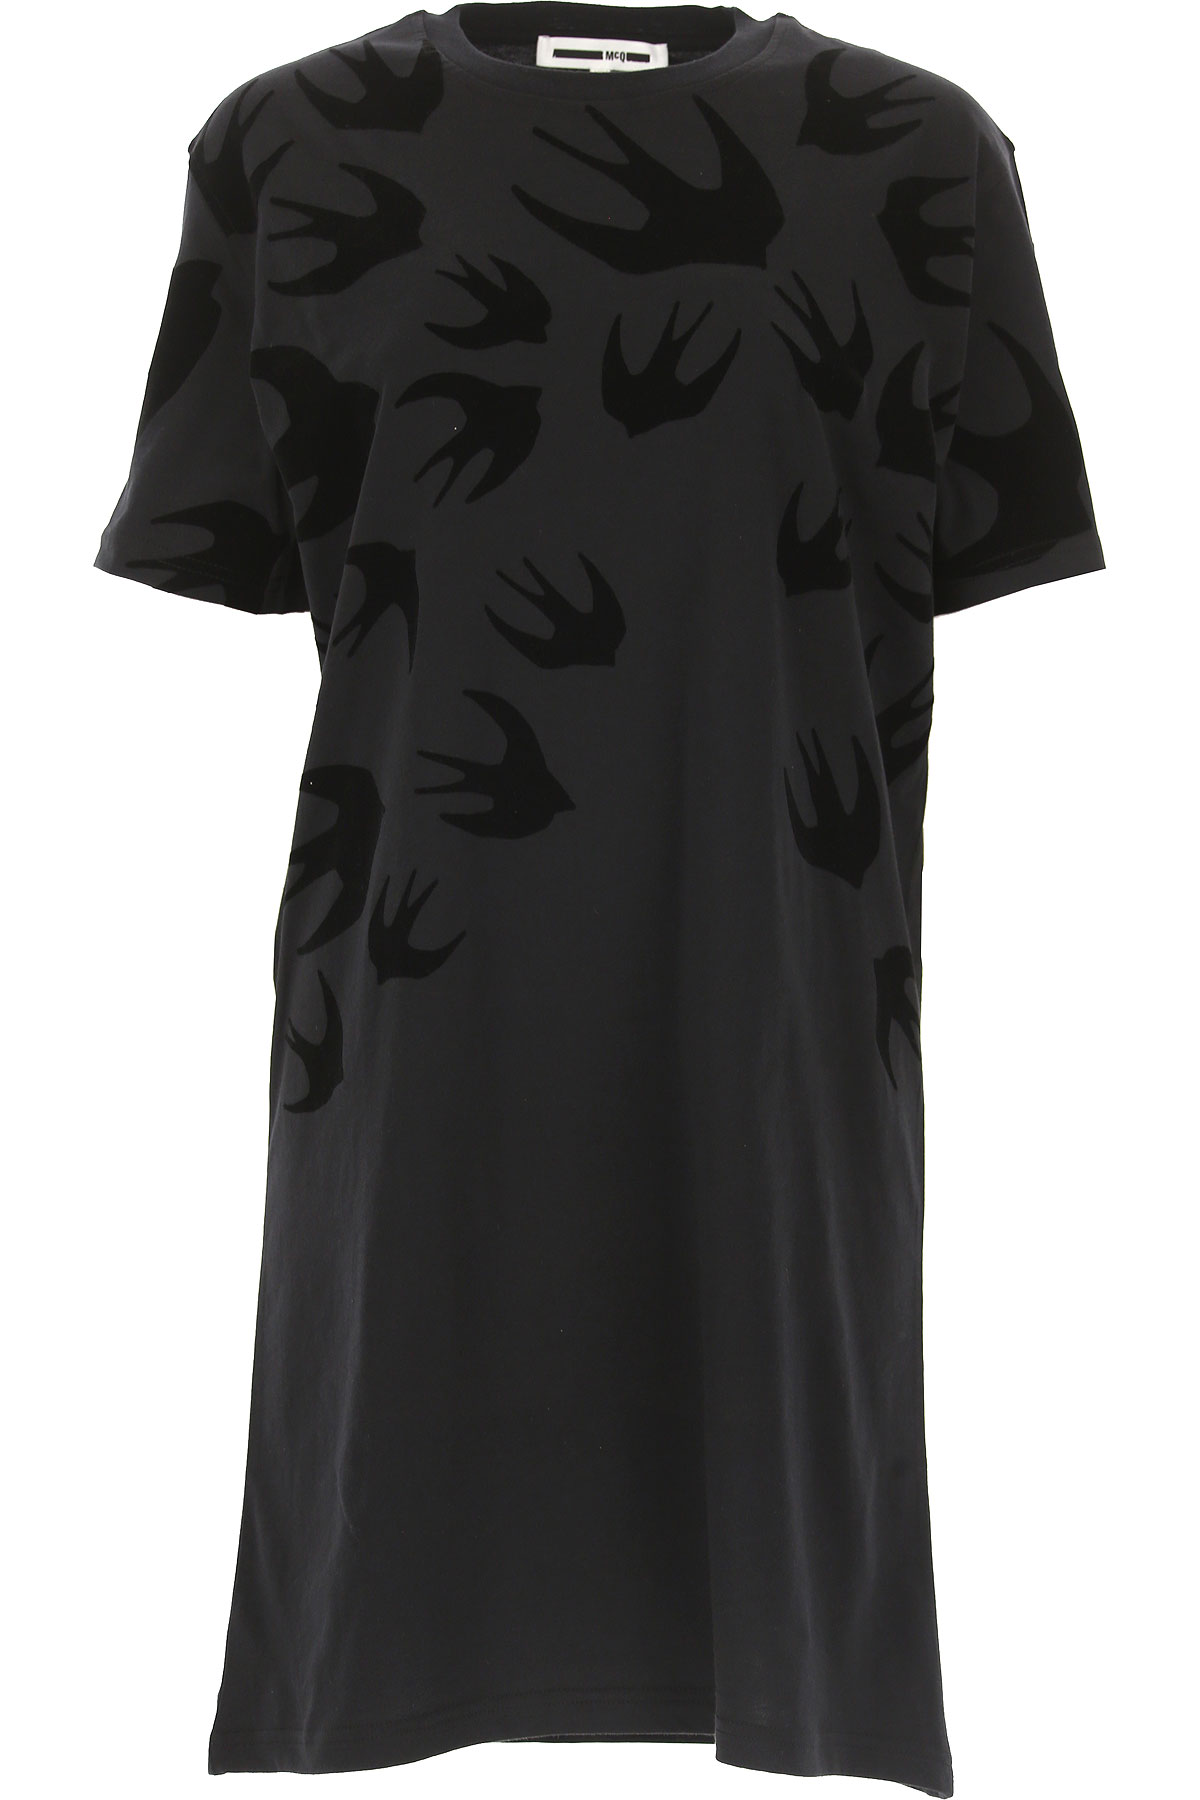 Alexander McQueen McQ Dress for Women, Evening Cocktail Party On Sale, Black, Cotton, 2019, 2 4 6